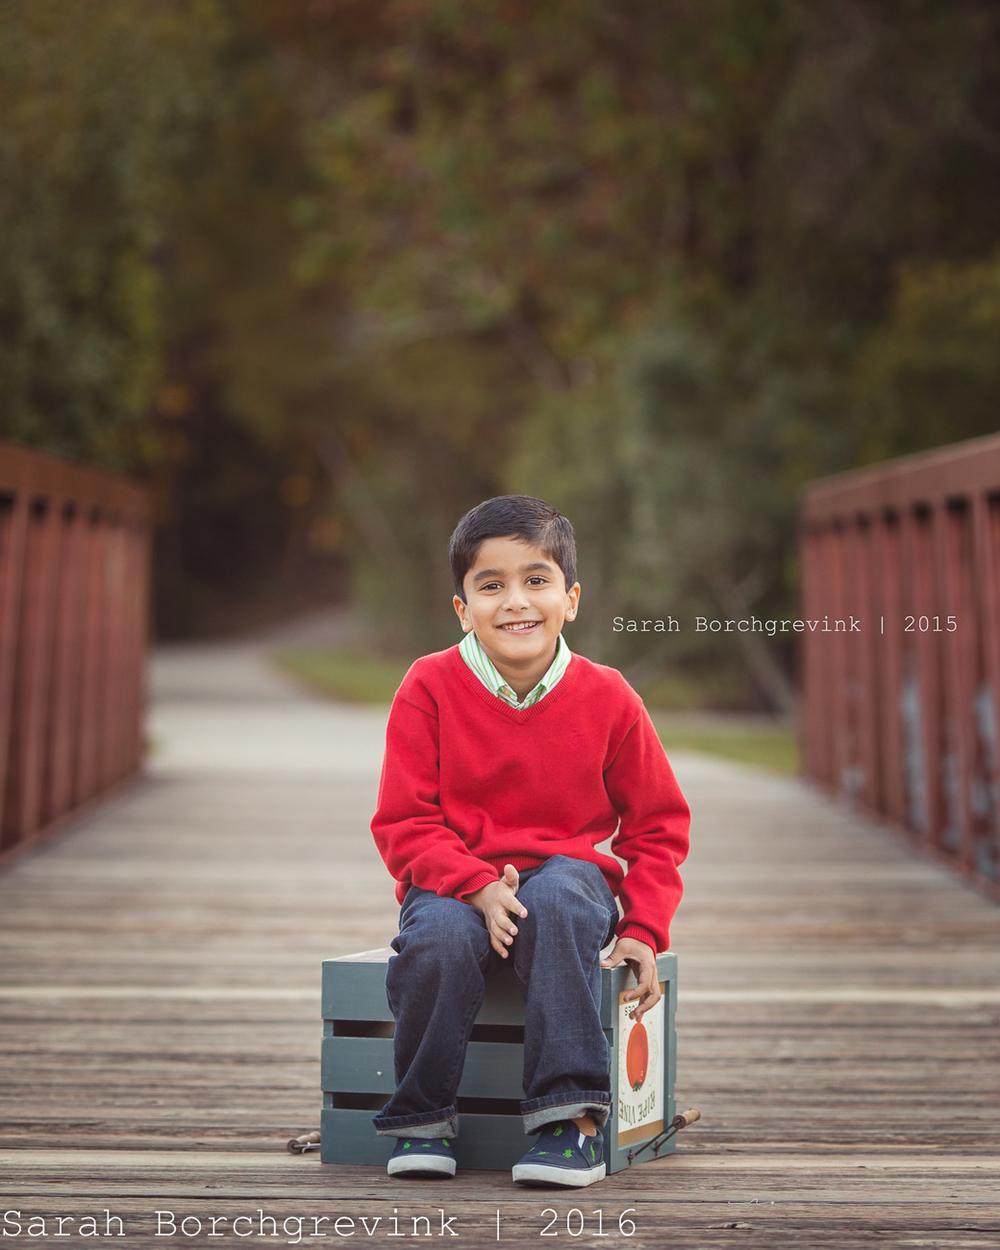 Children's Photographer | Northwest Houston 77095